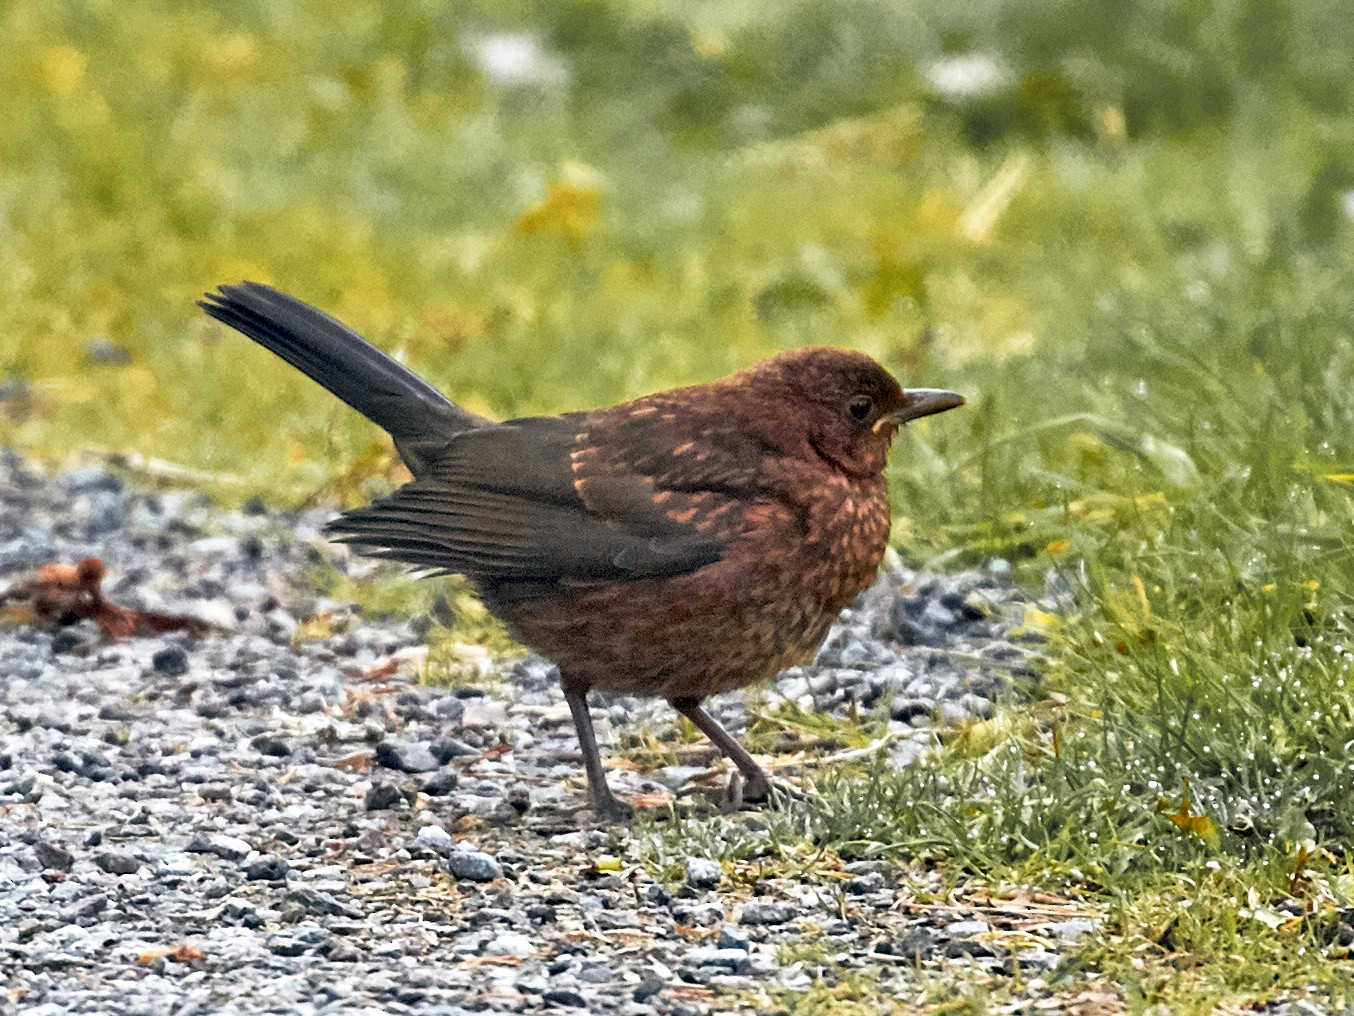 Eurasian Blackbird - Brooke Miller